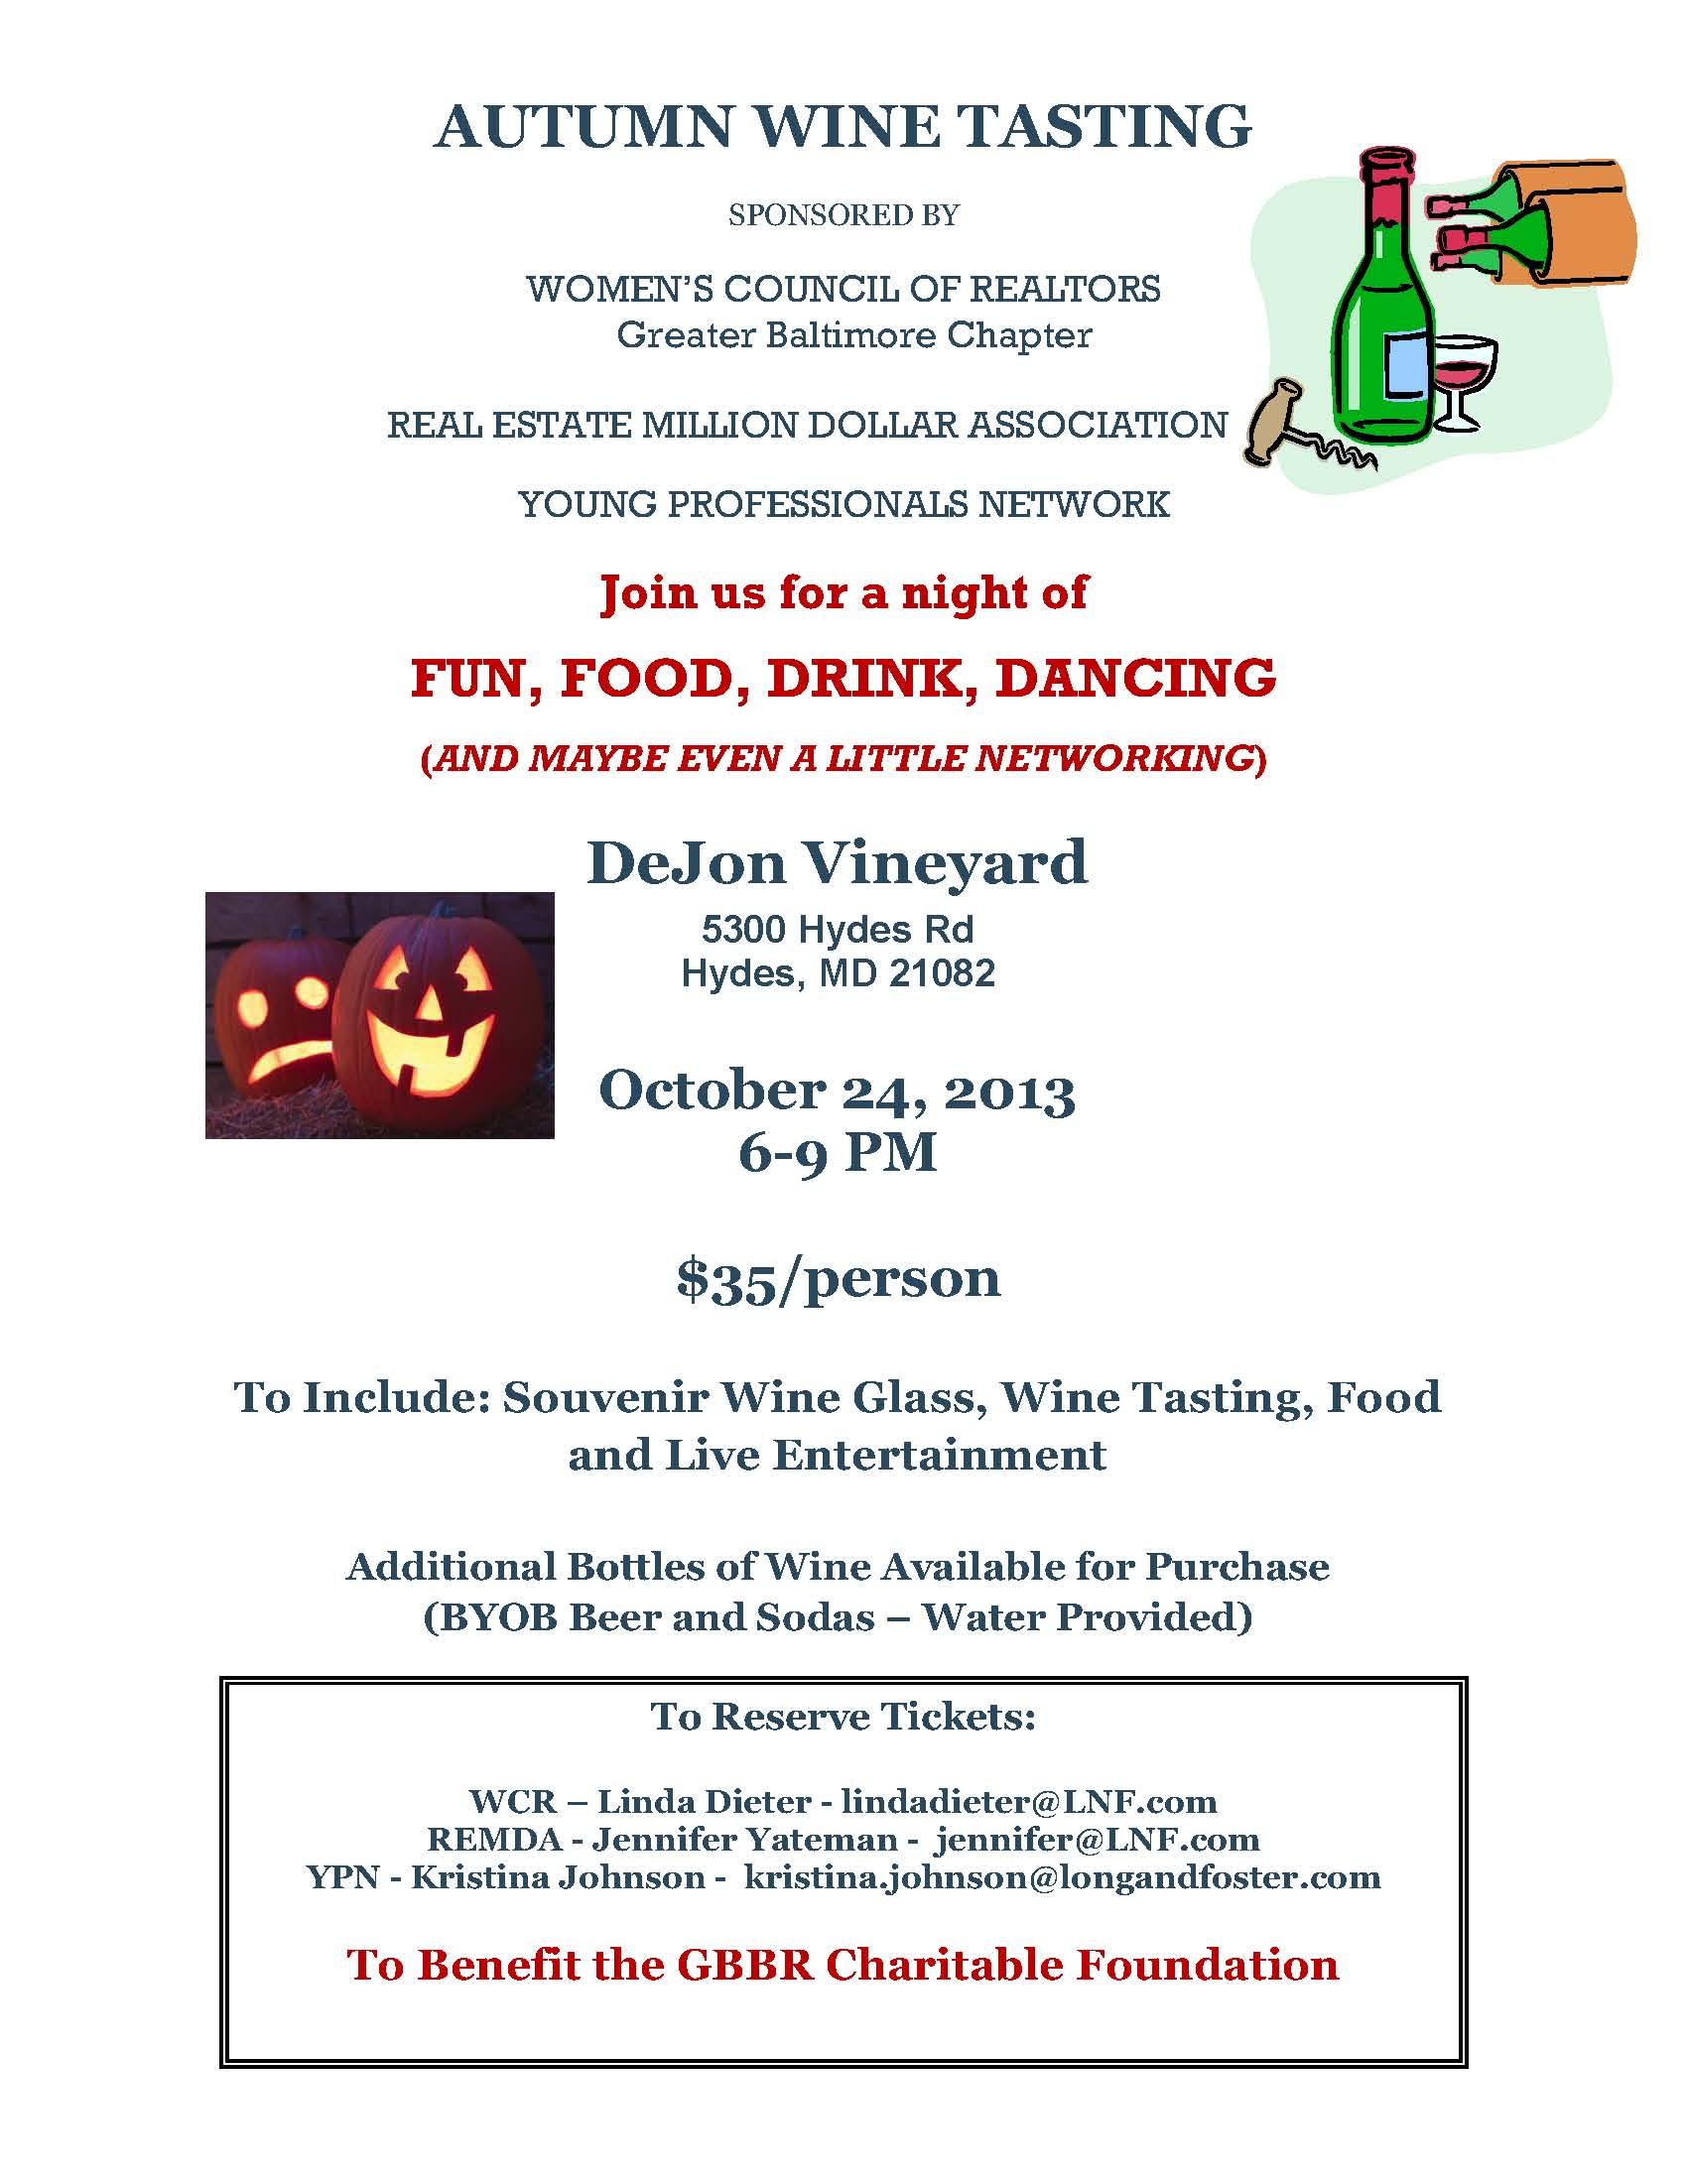 Wine Tasting Flyer 2013